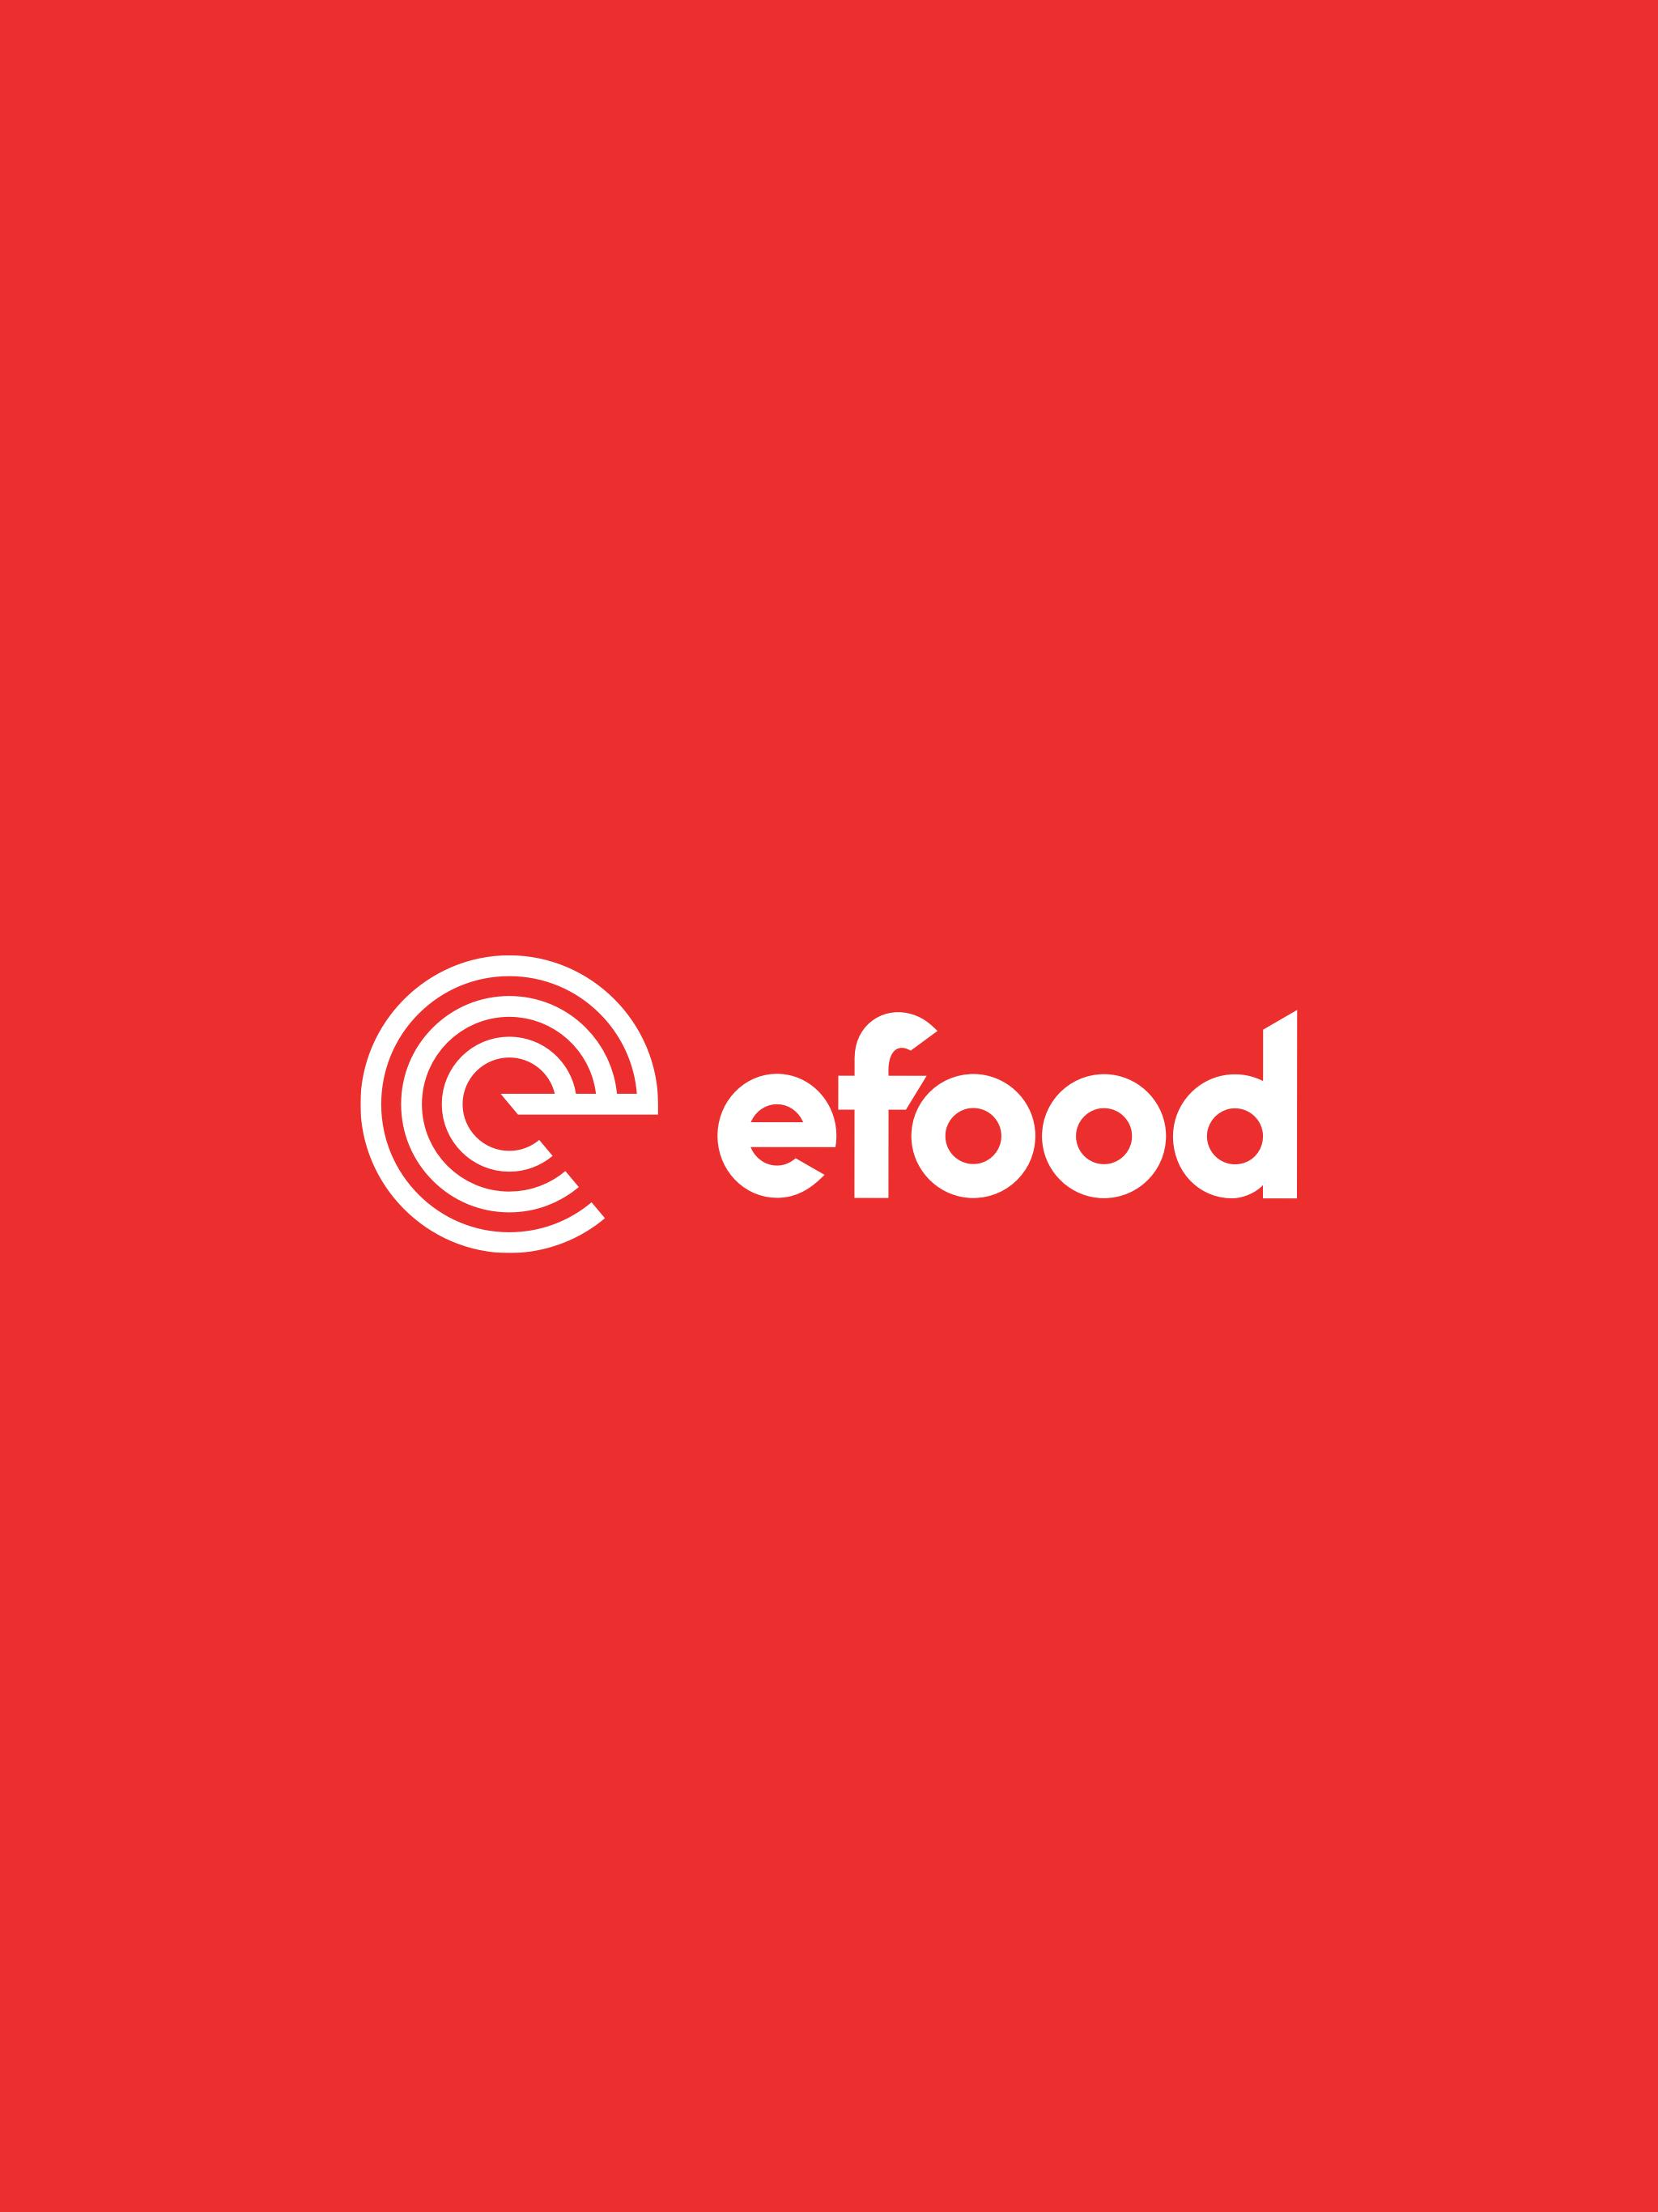 efood delivery 4.6.1 Screenshot 9